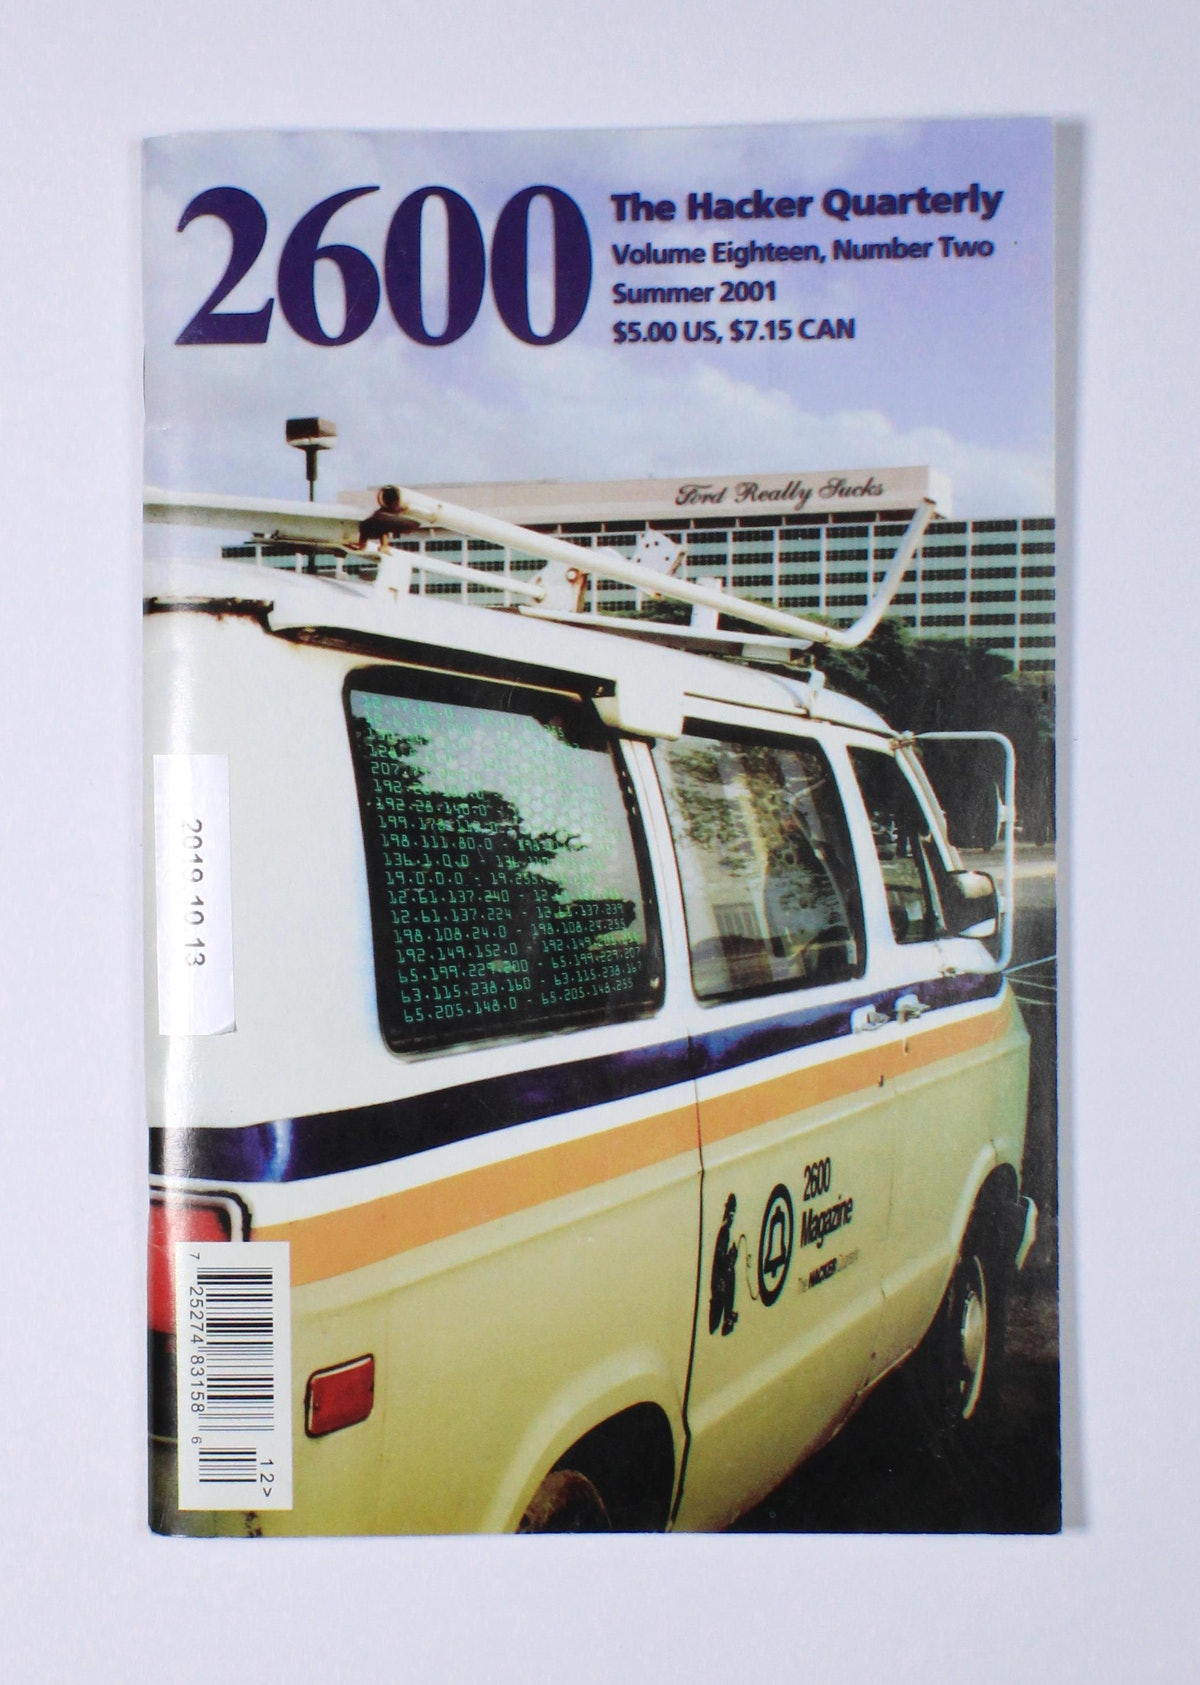 2600 The Hacker Quarterly